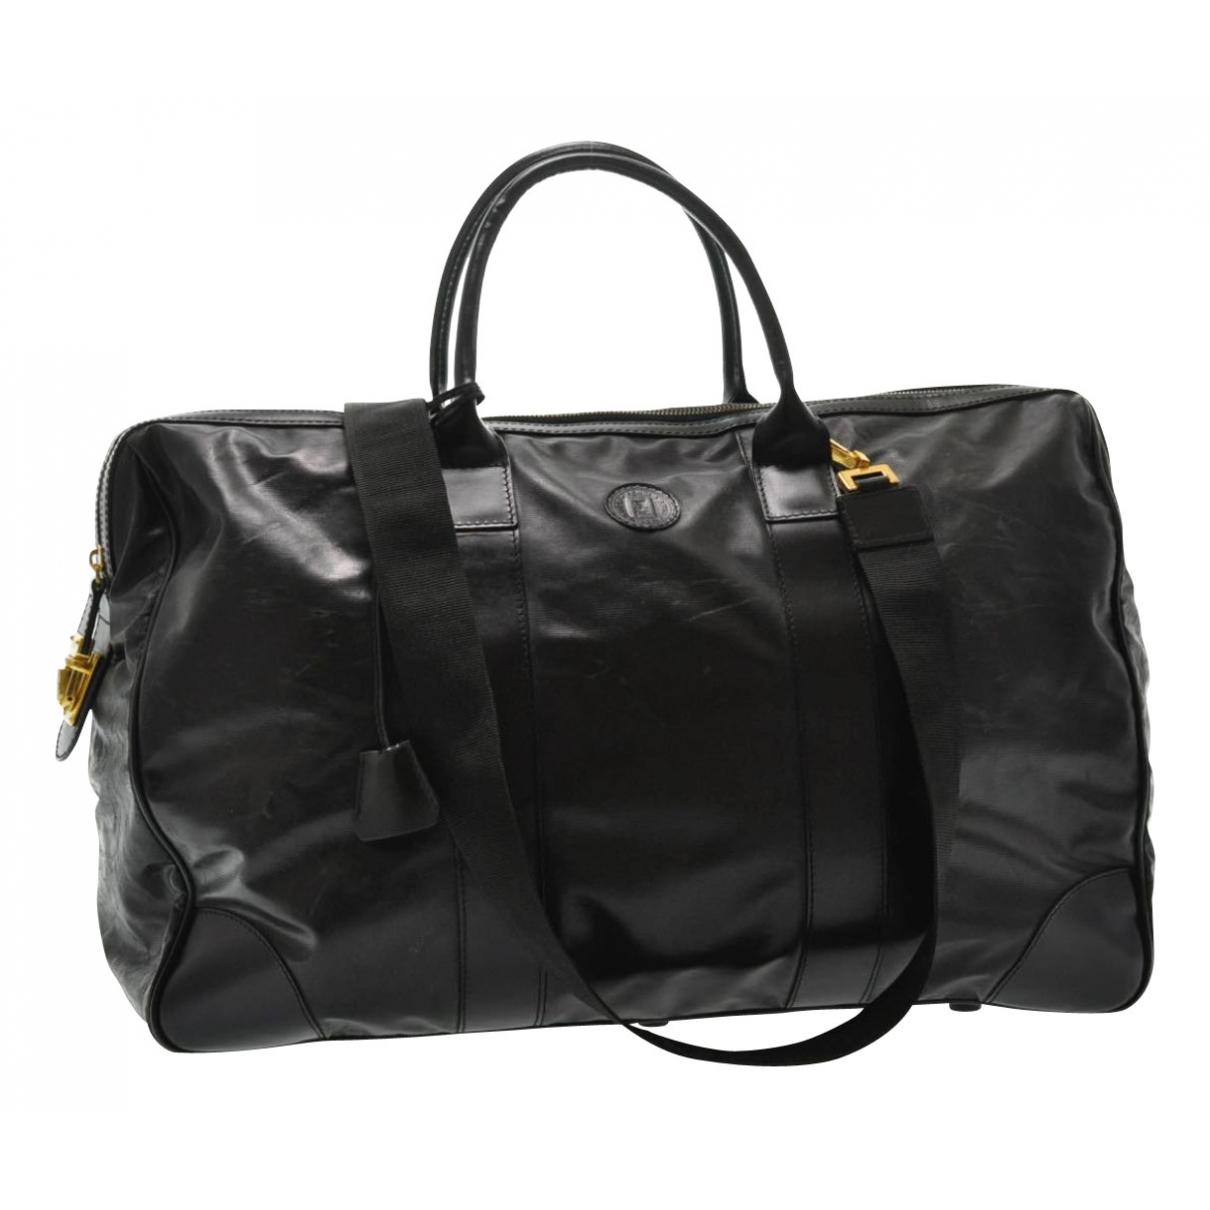 Fendi N Black Leather Travel bag for Women N